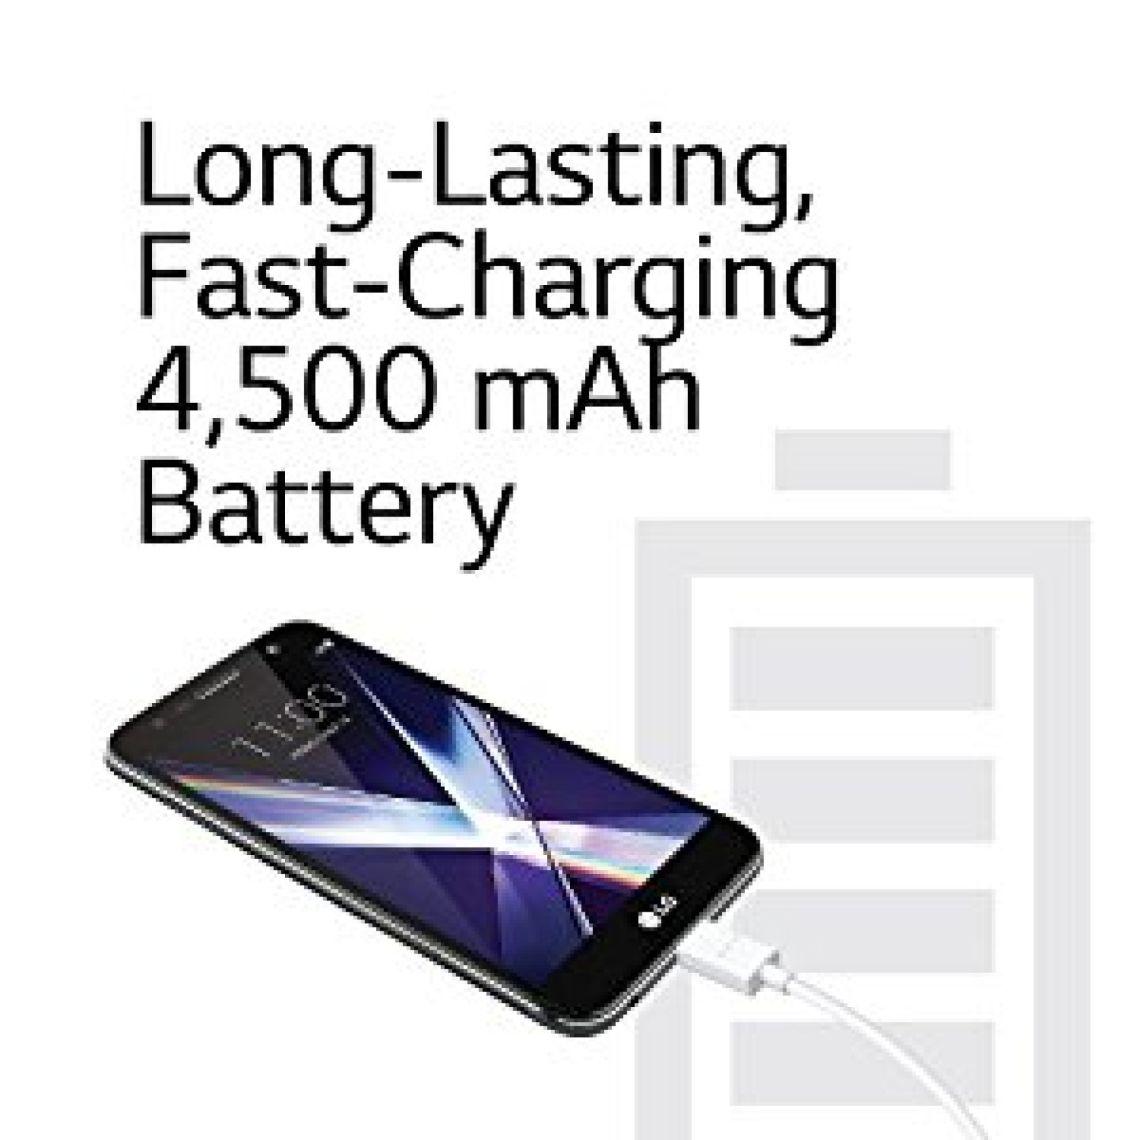 Amazon.com: LG X charge - 16 GB – Unlocked (AT&T/Sprint/T-Mobile) - Titanium - Prime Exclusive: Cell Phones & Accessories